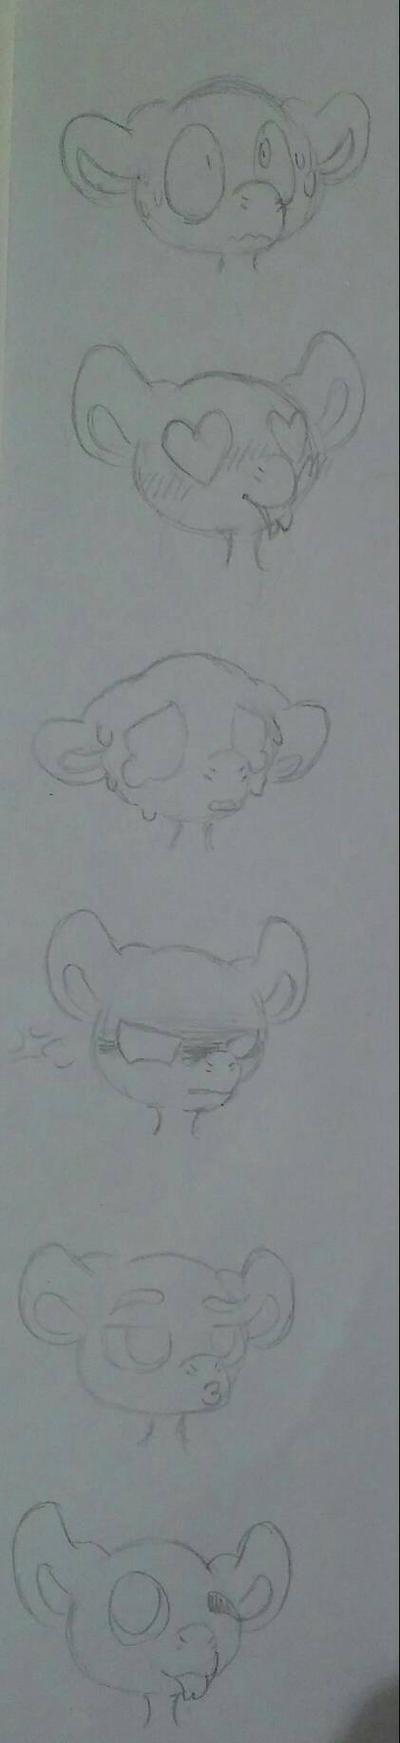 YBH: Expressions by arteest76